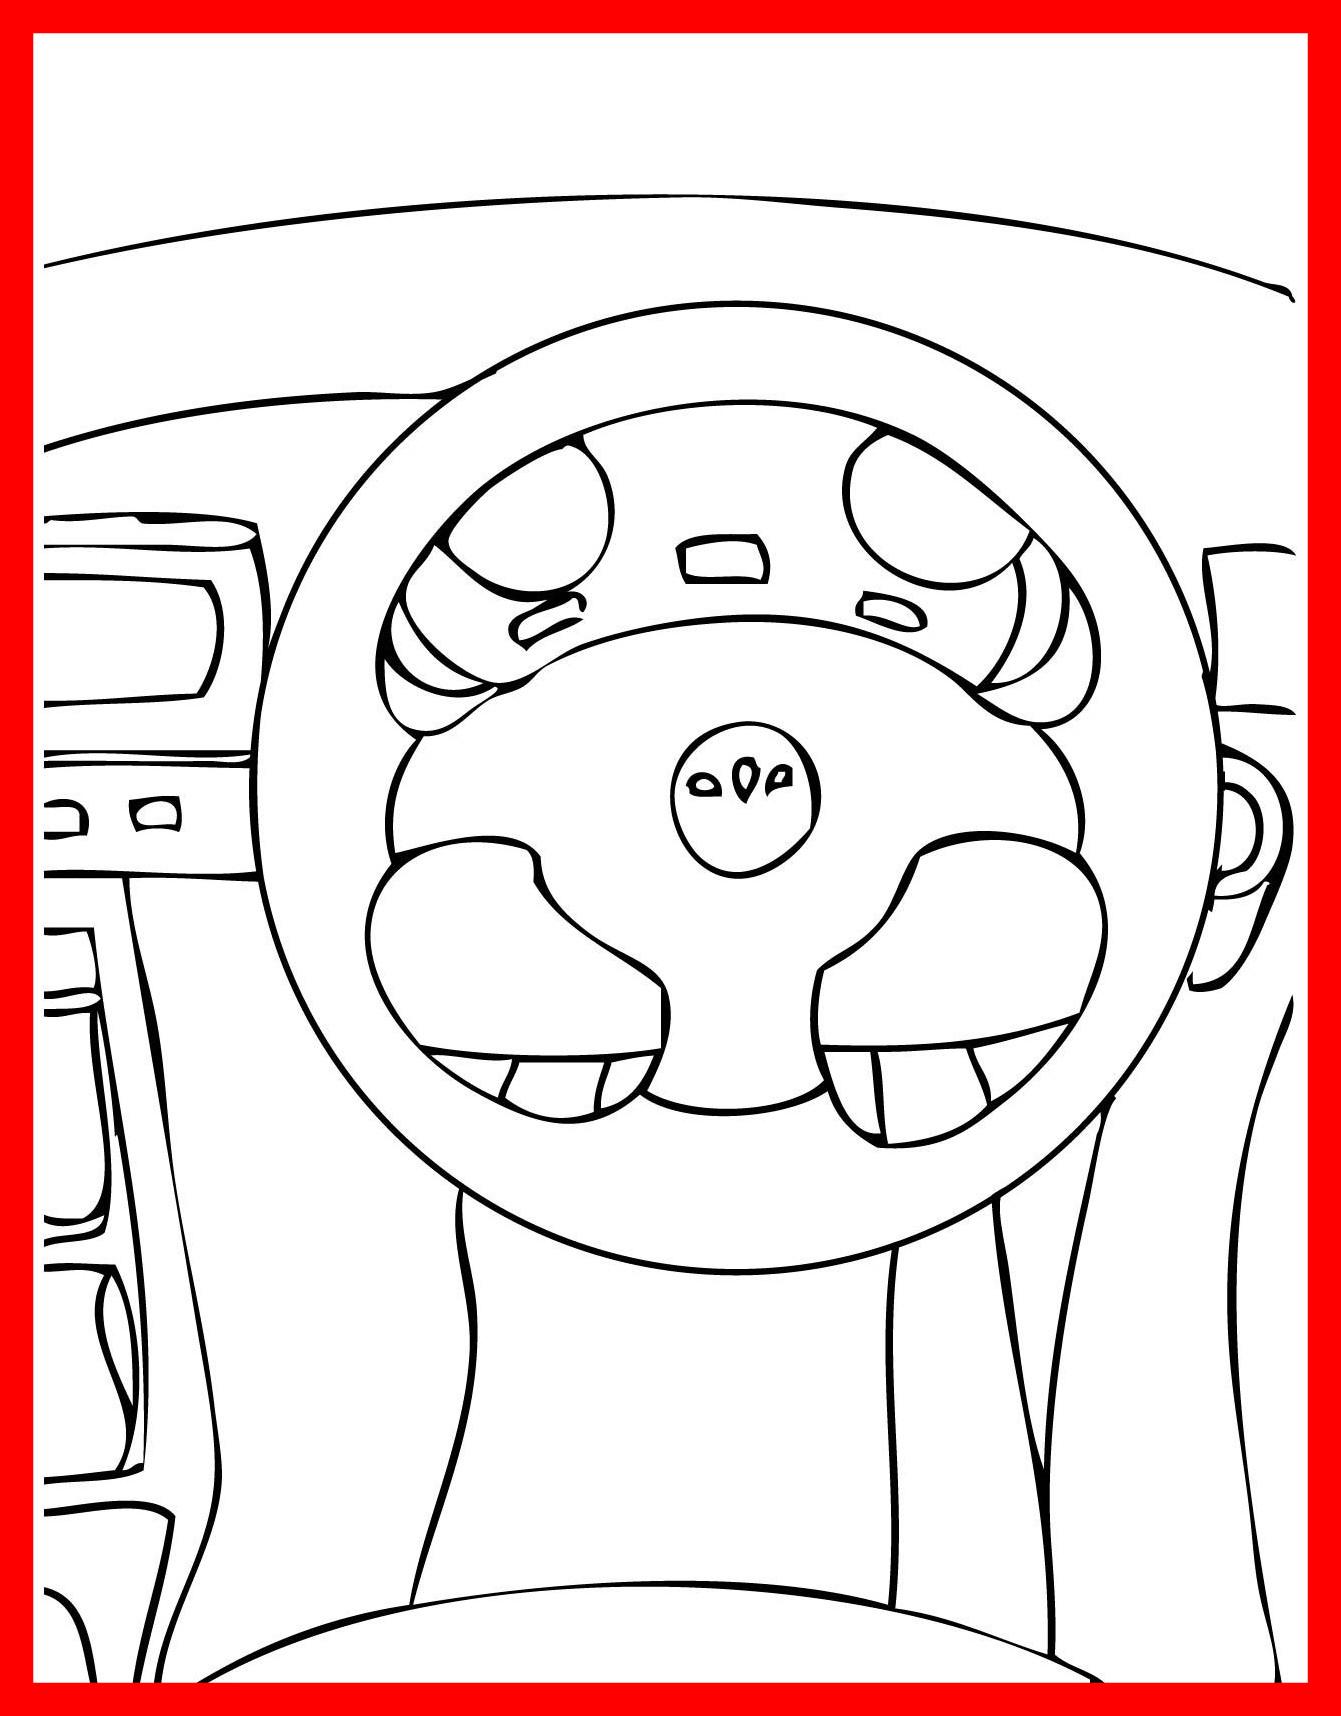 1341x1716 Car Wheel Coloring Page